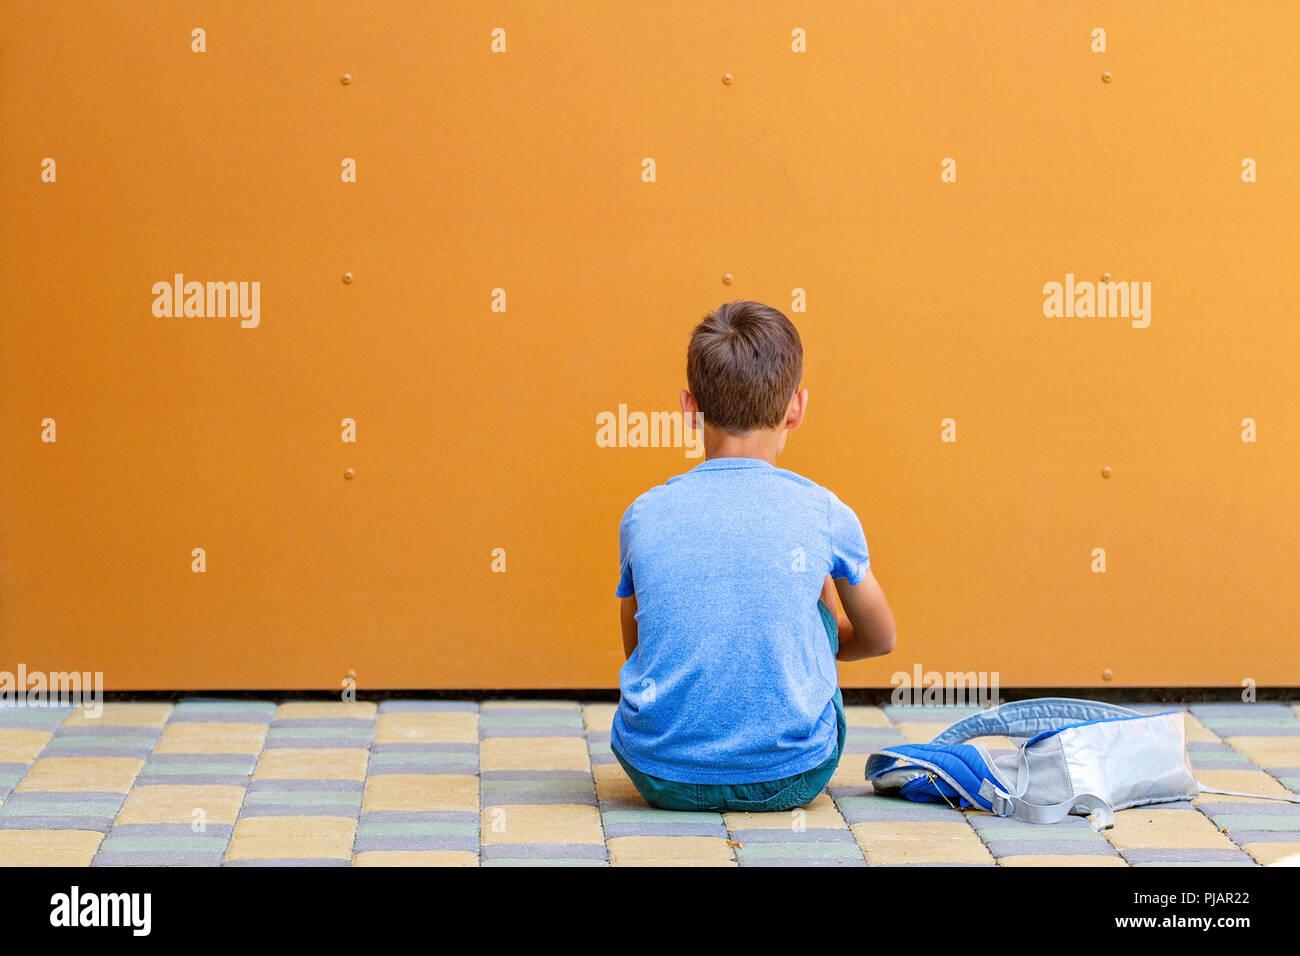 Sad alone boy sitting near colorful wall outdoors